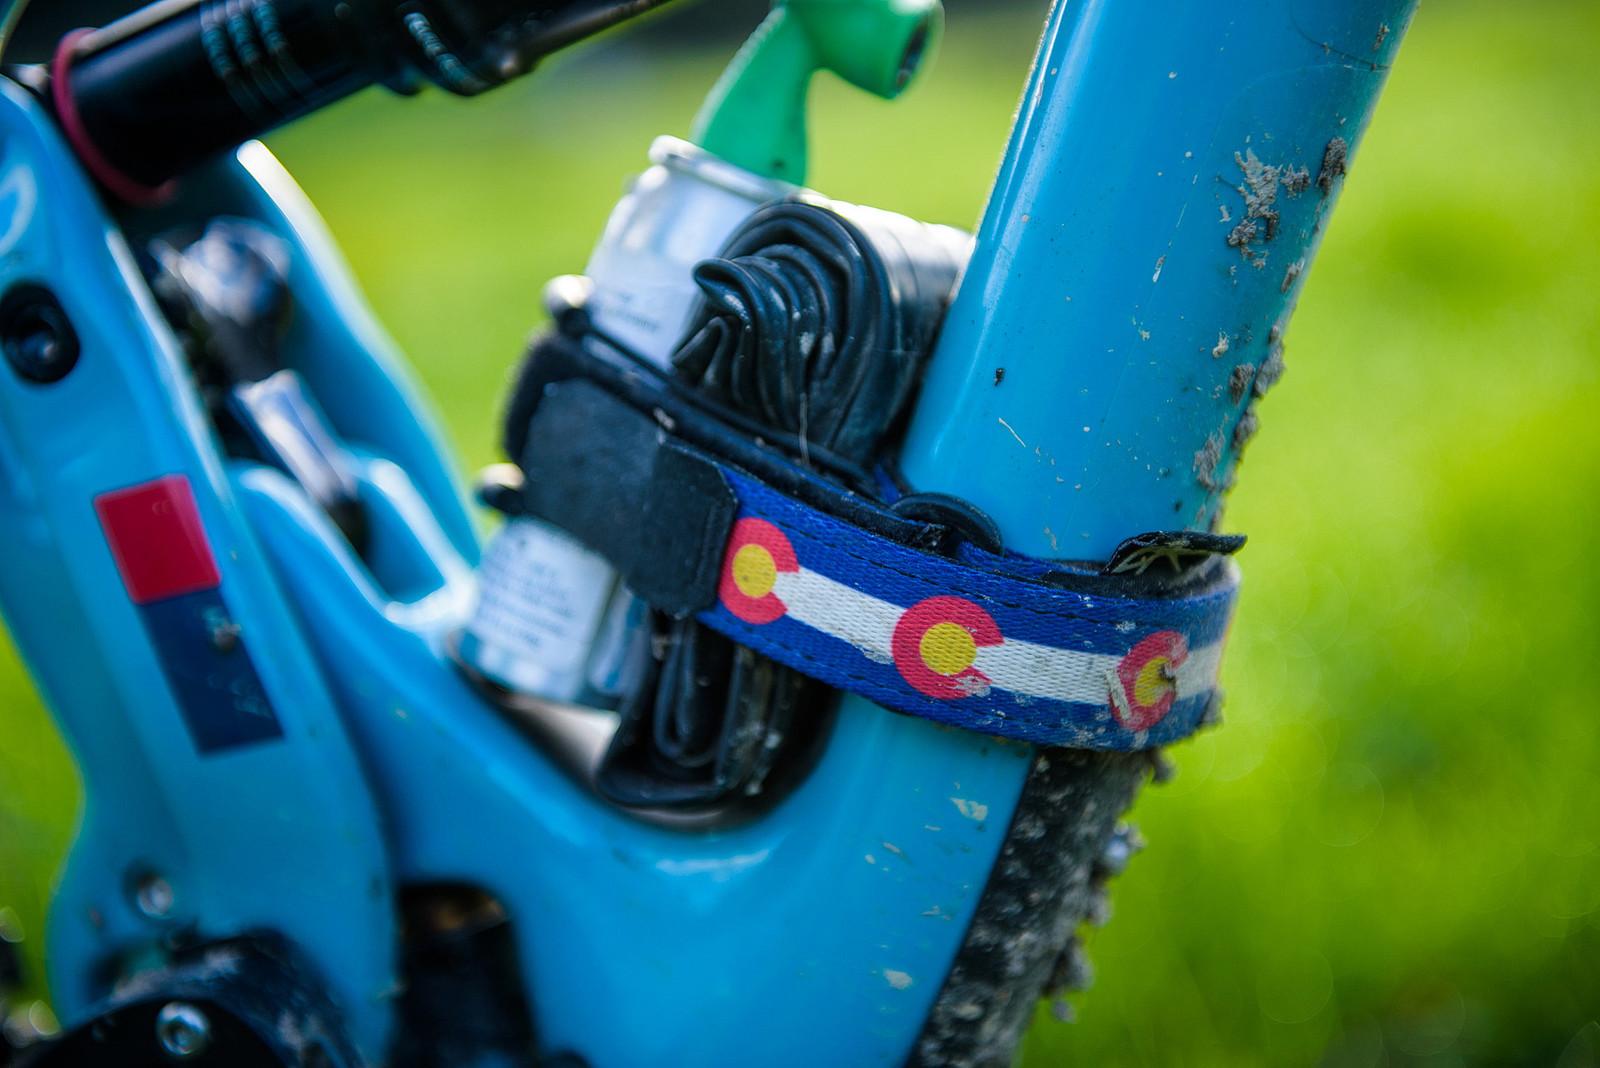 Backcountry Research Gear Strap - Nate Hills' Yeti SB5 with 2019 RockShox Lyrik - Mountain Biking Pictures - Vital MTB